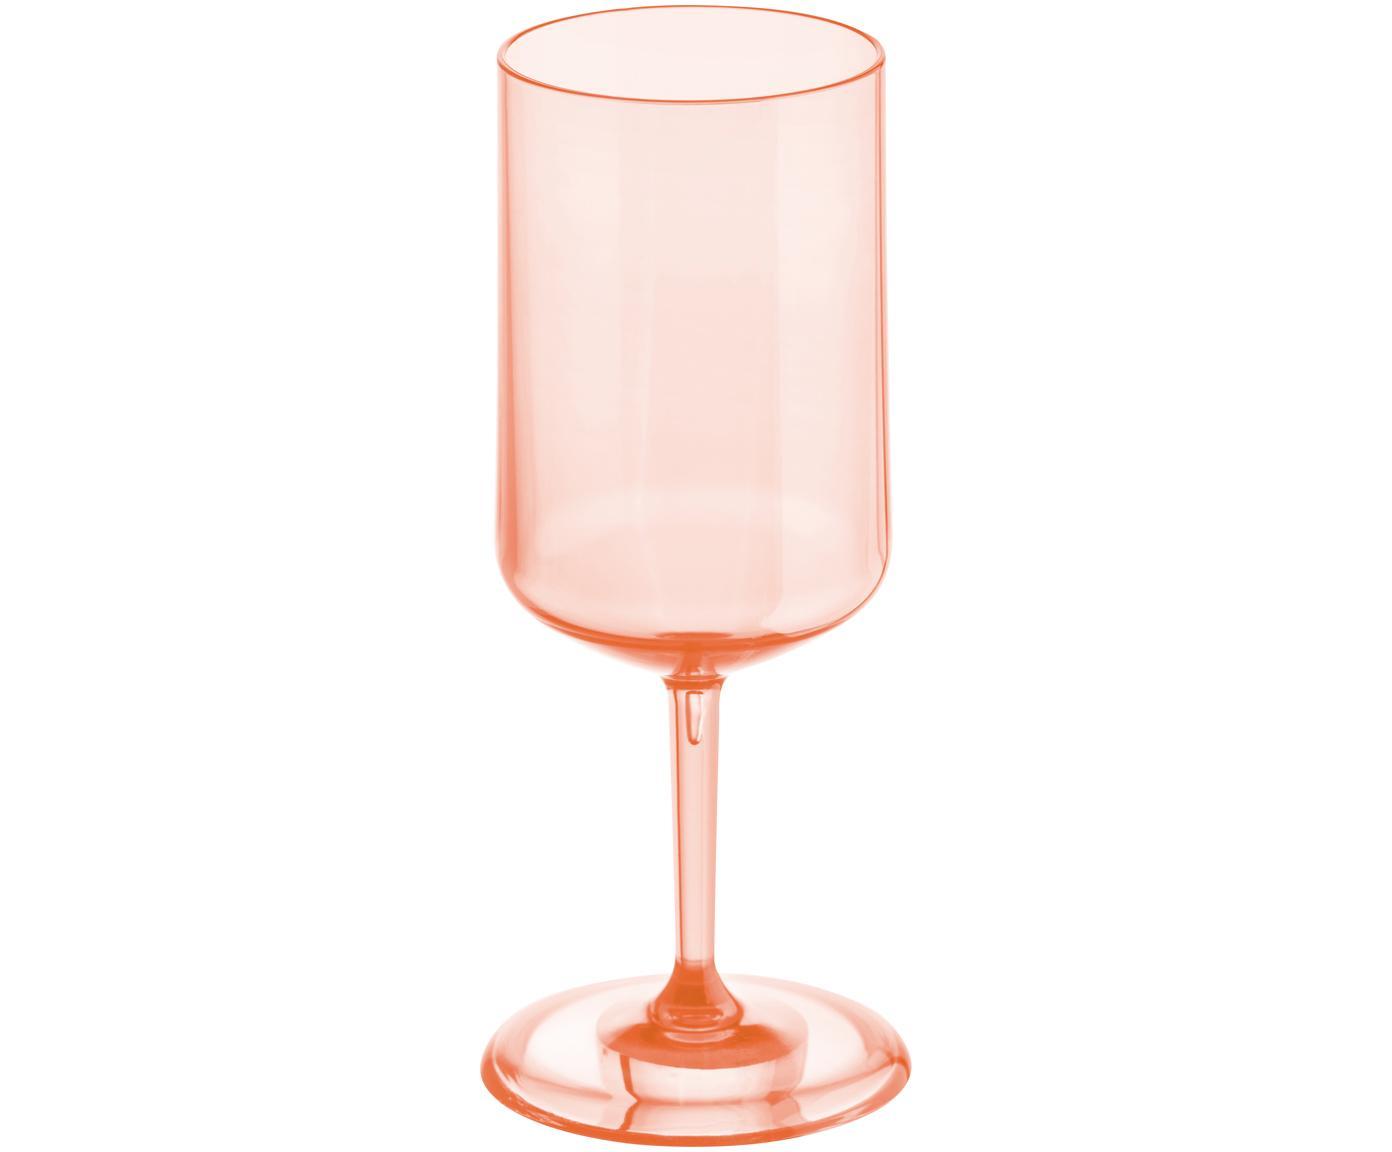 Breukvast kunststoffen witte wijnglas Cheers, Thermoplastisch kunststof (superglas), Rozenkwarts, transparant, Ø 9 x H 21 cm